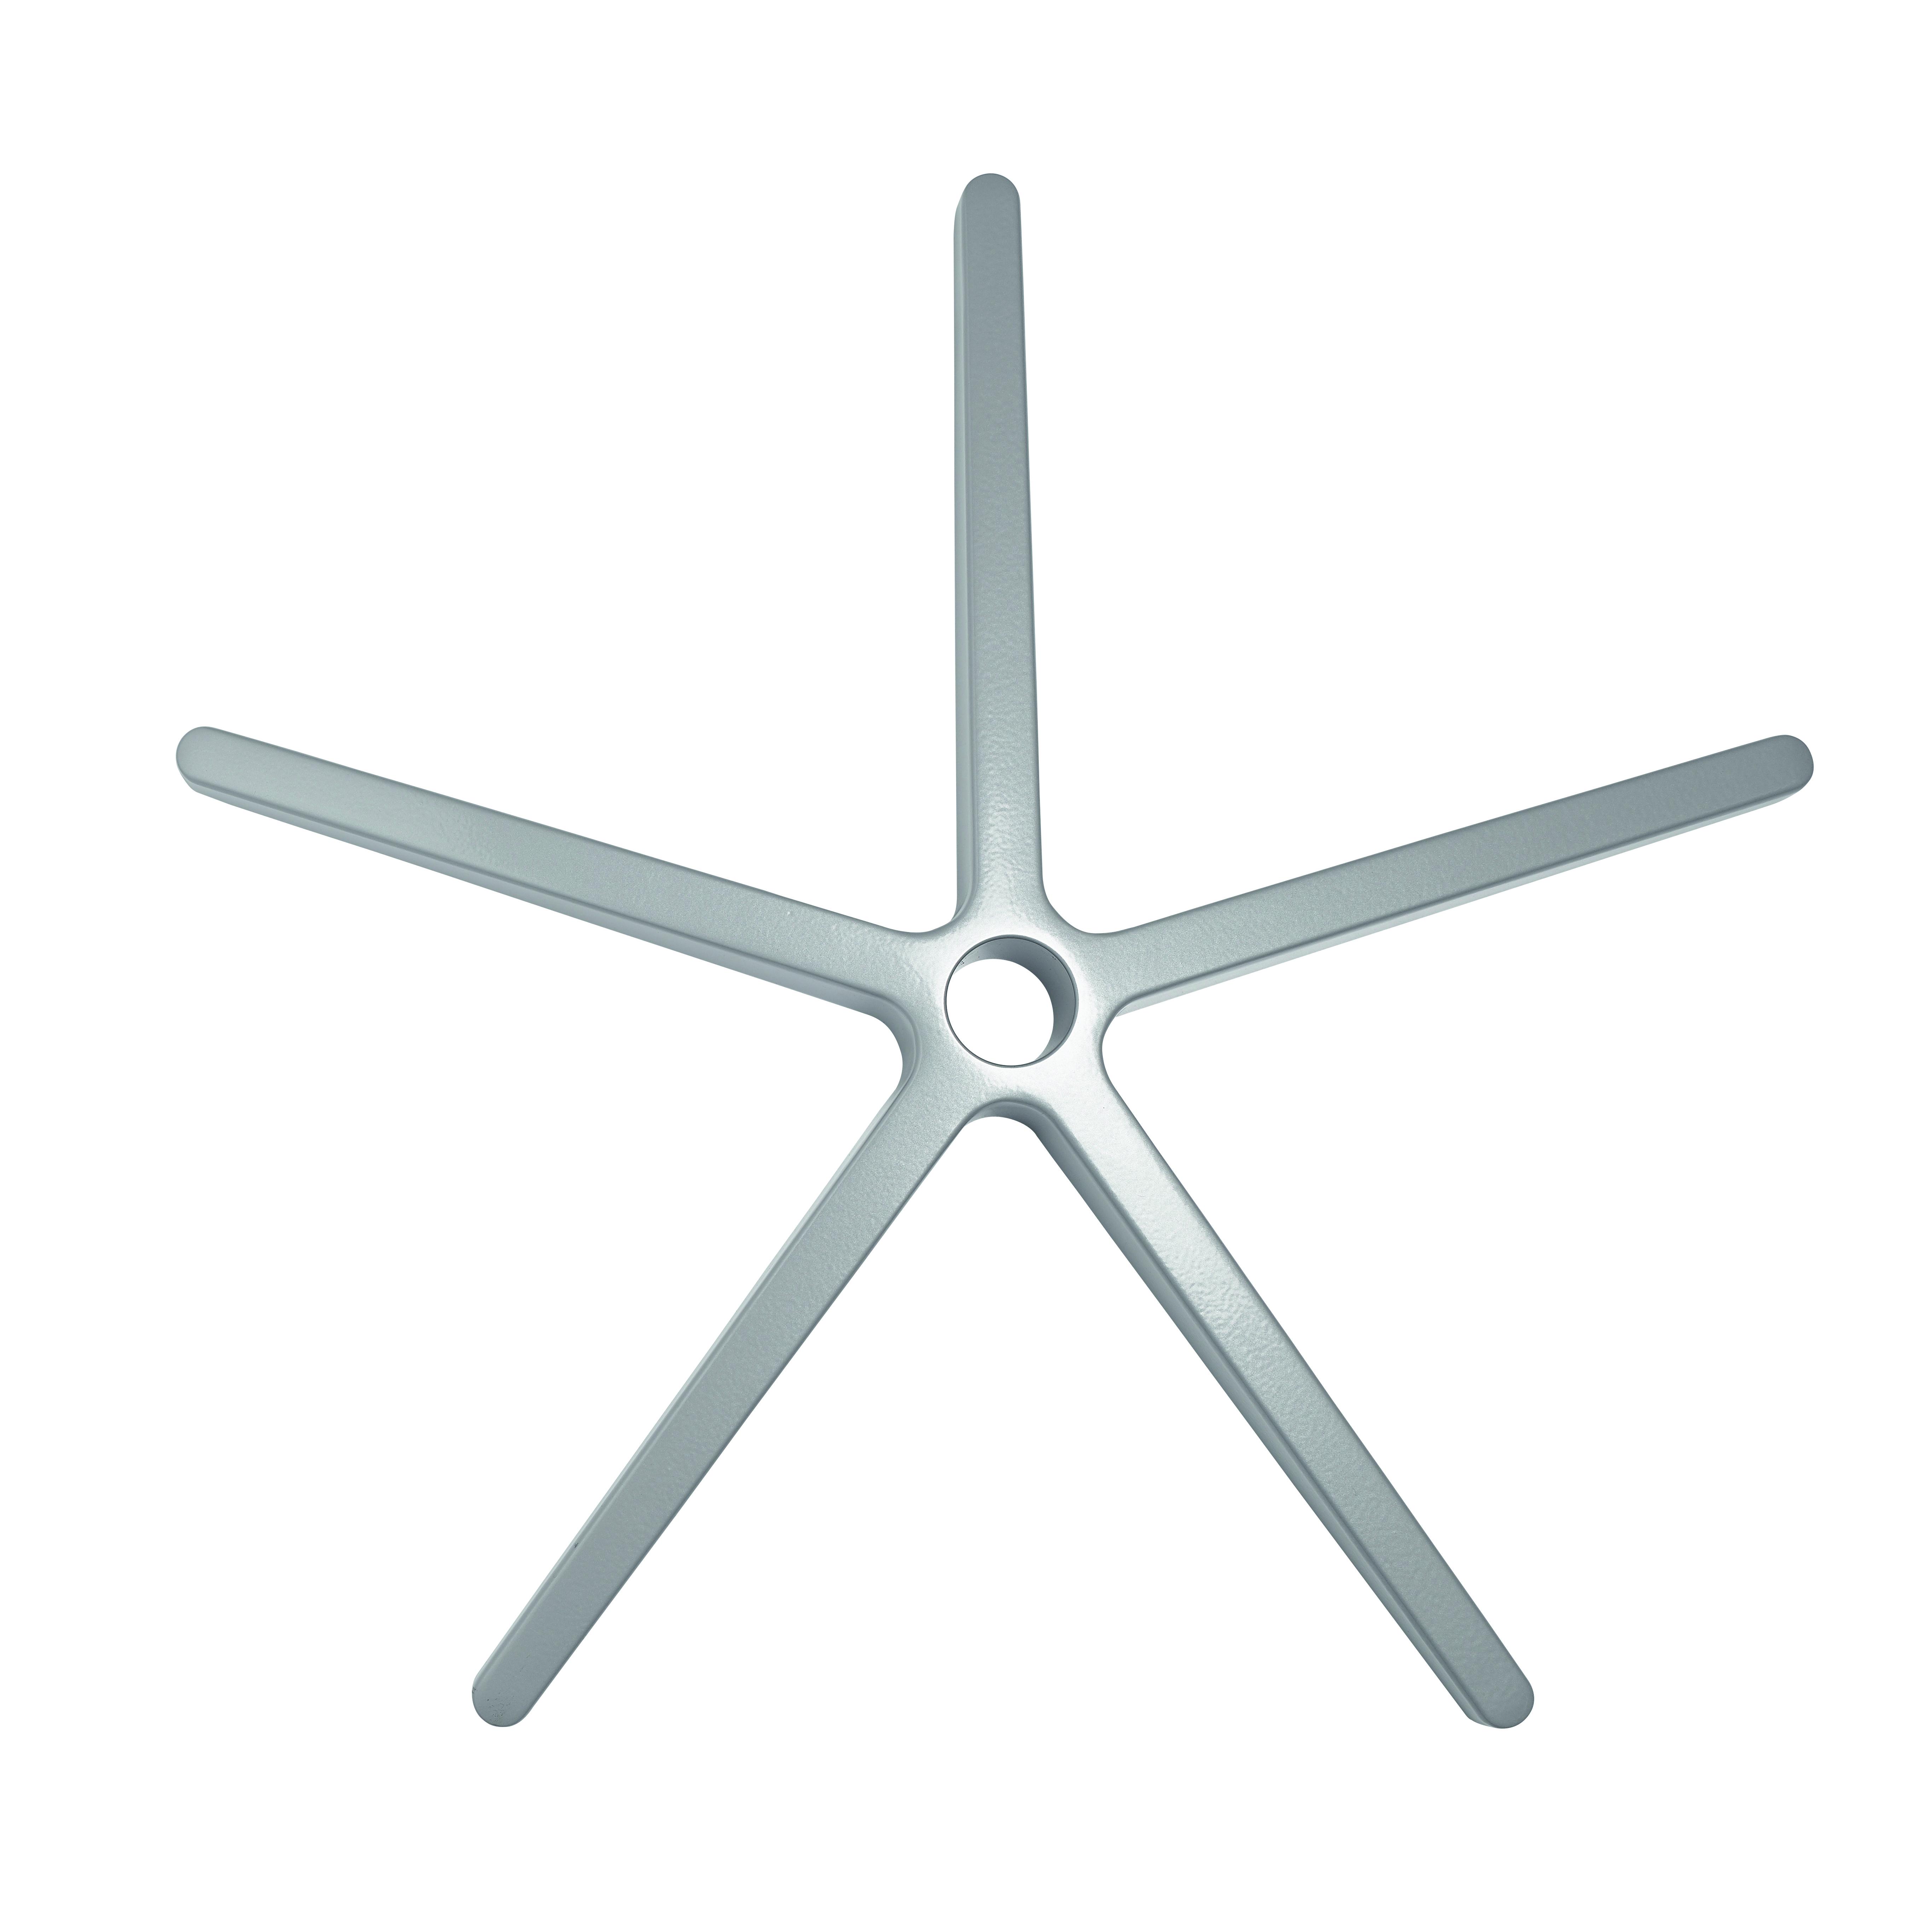 Kříž RAL 9006 - stříbrný